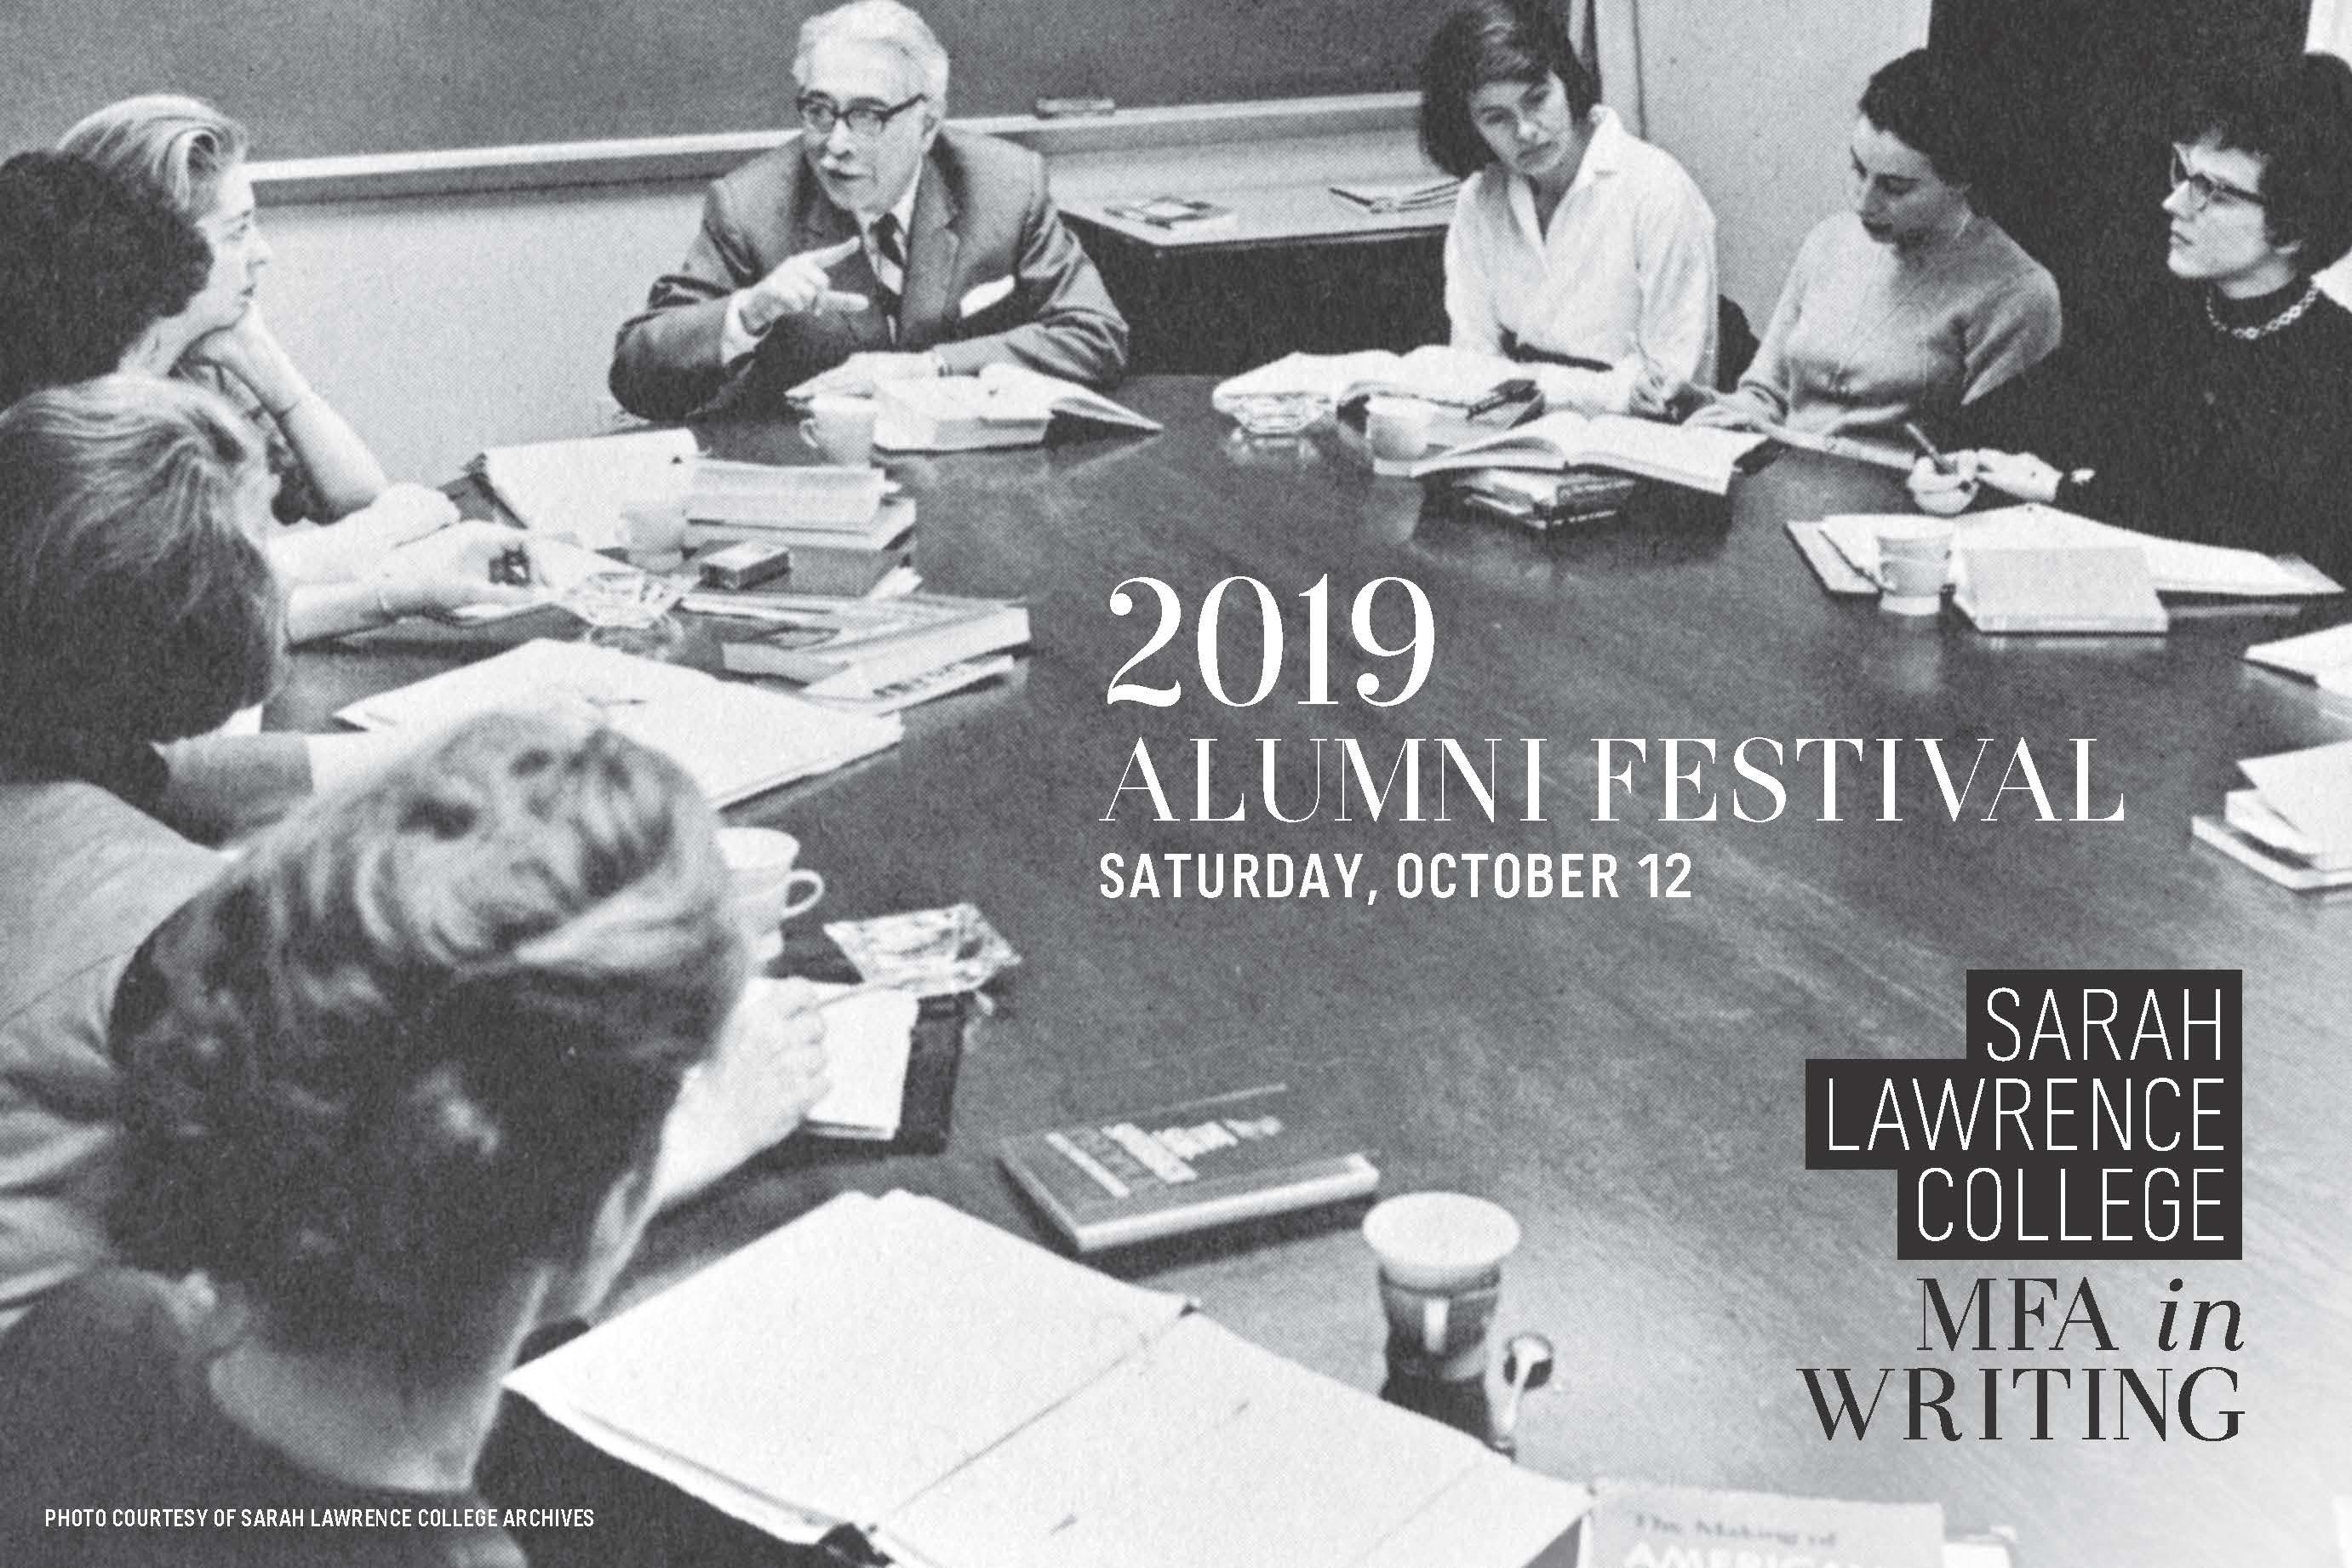 Sarah Lawrence College MFA Writing Alumni Festival